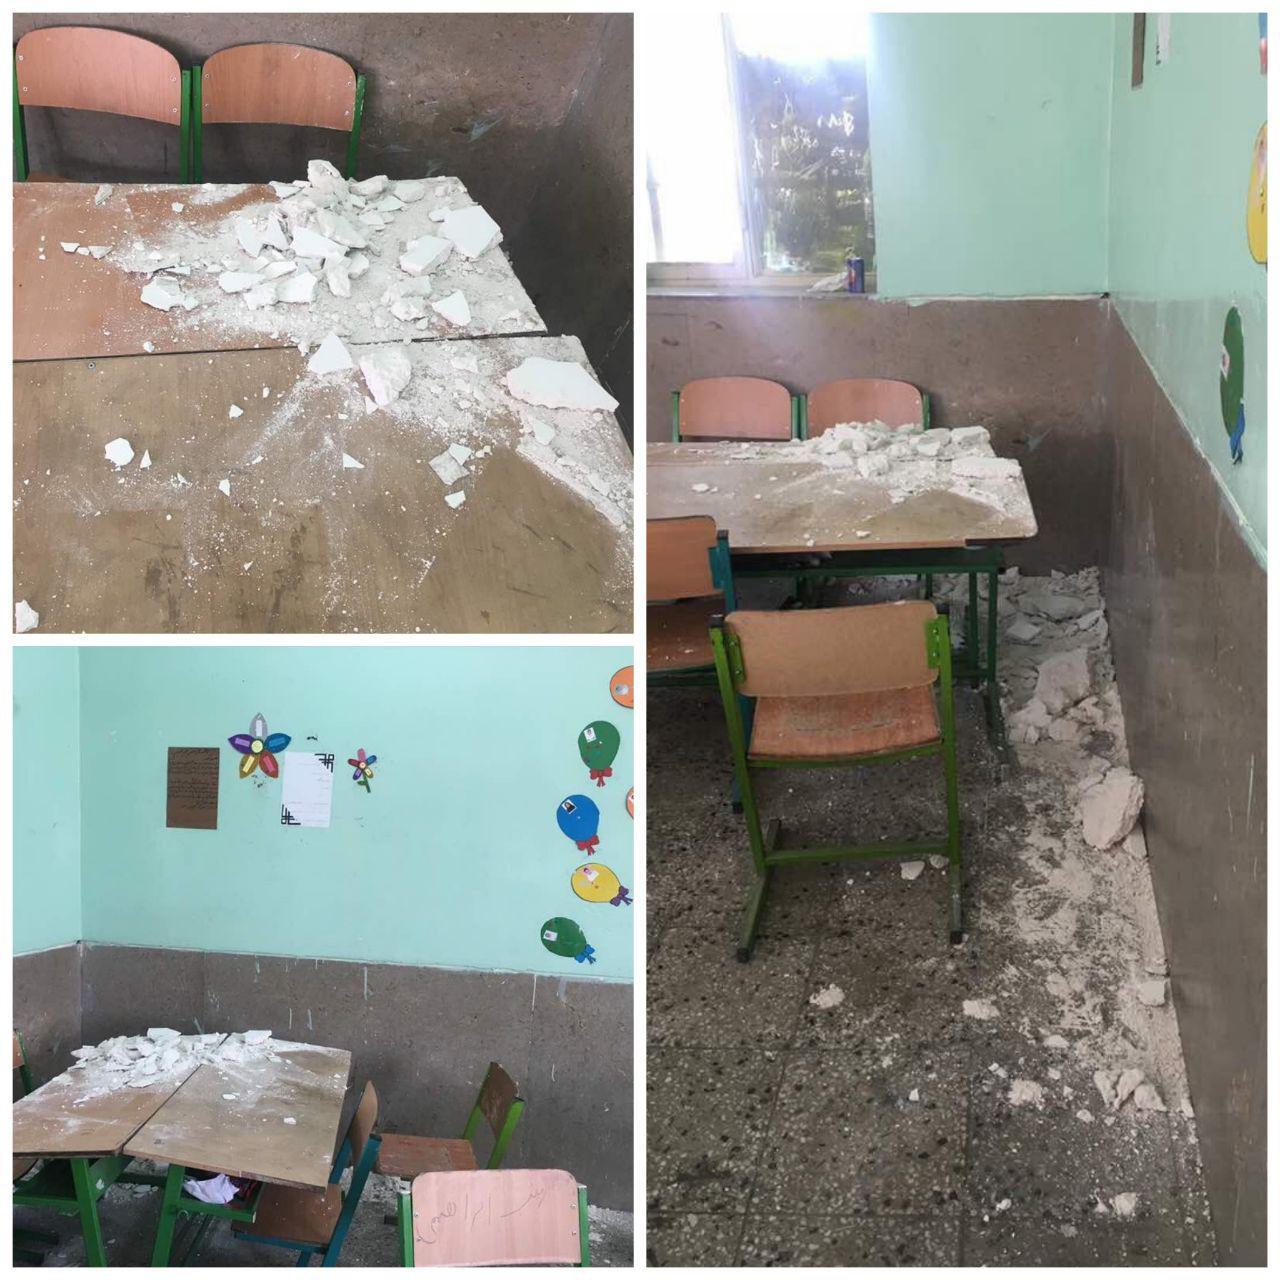 سقف غیر ایمن مدارس